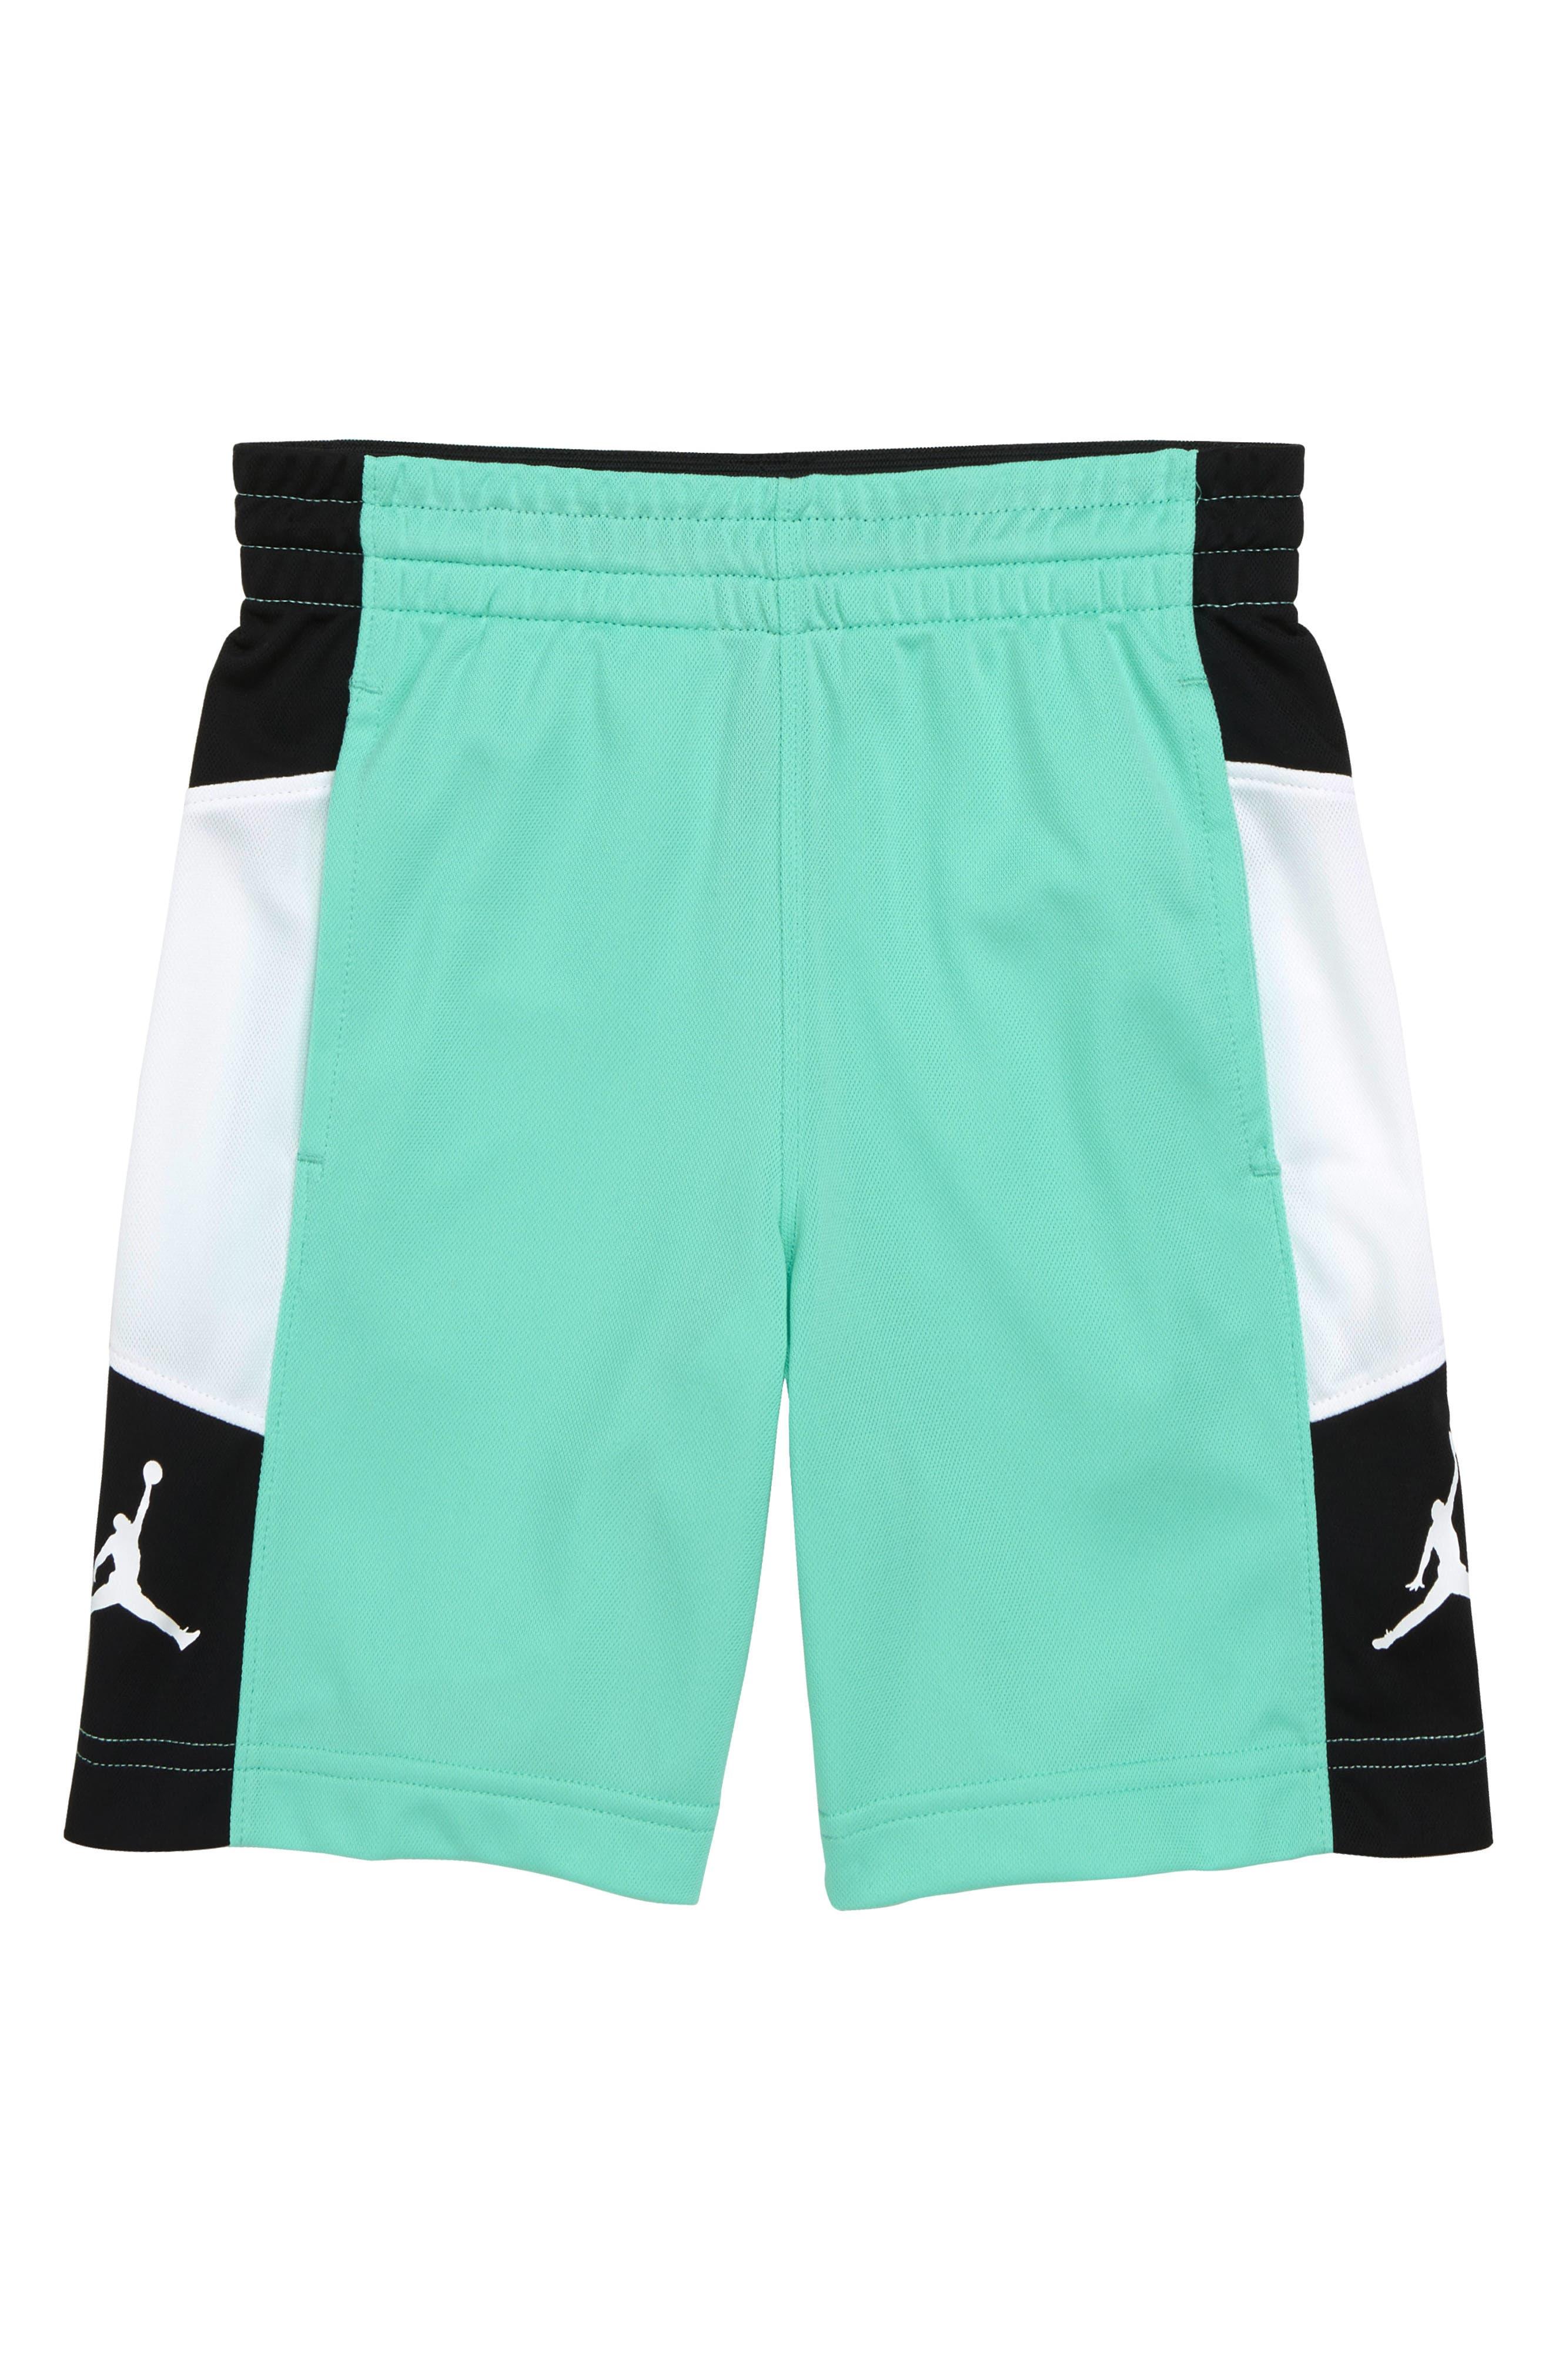 Jordan Rise Elevate Shorts,                             Main thumbnail 1, color,                             Emerald Rise